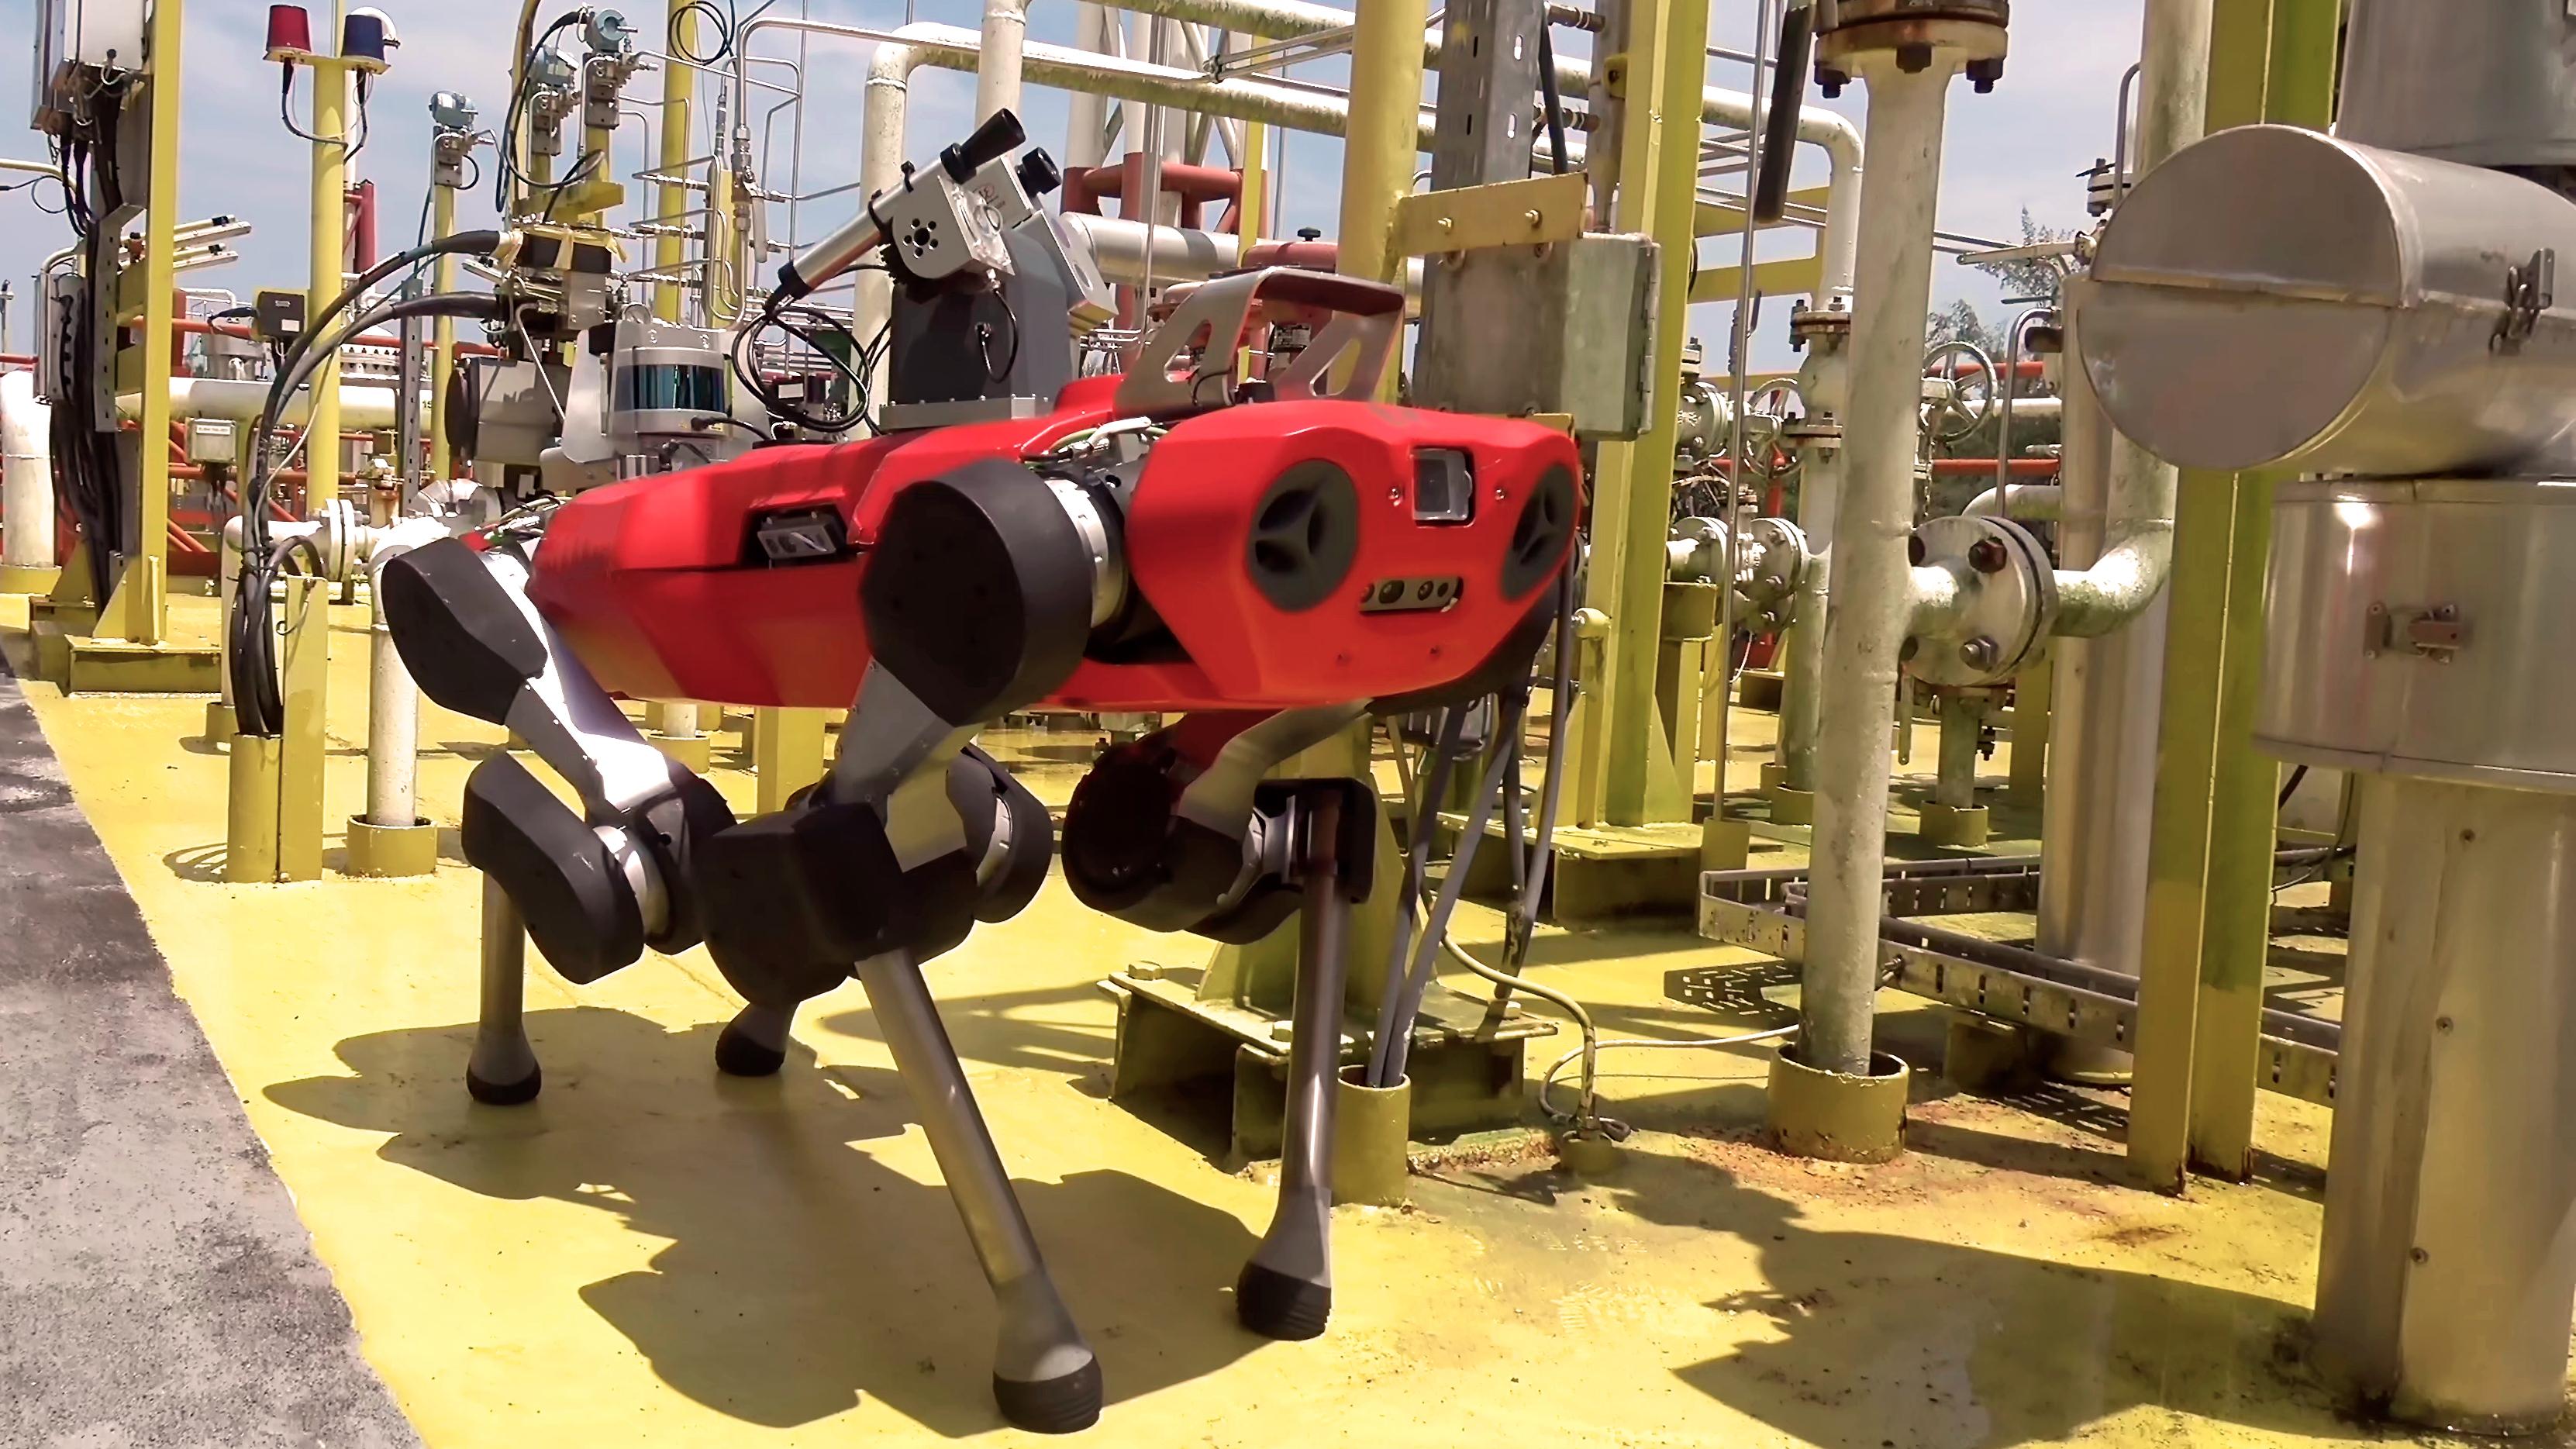 ANYmal Autonomous Robot Offshore Energy